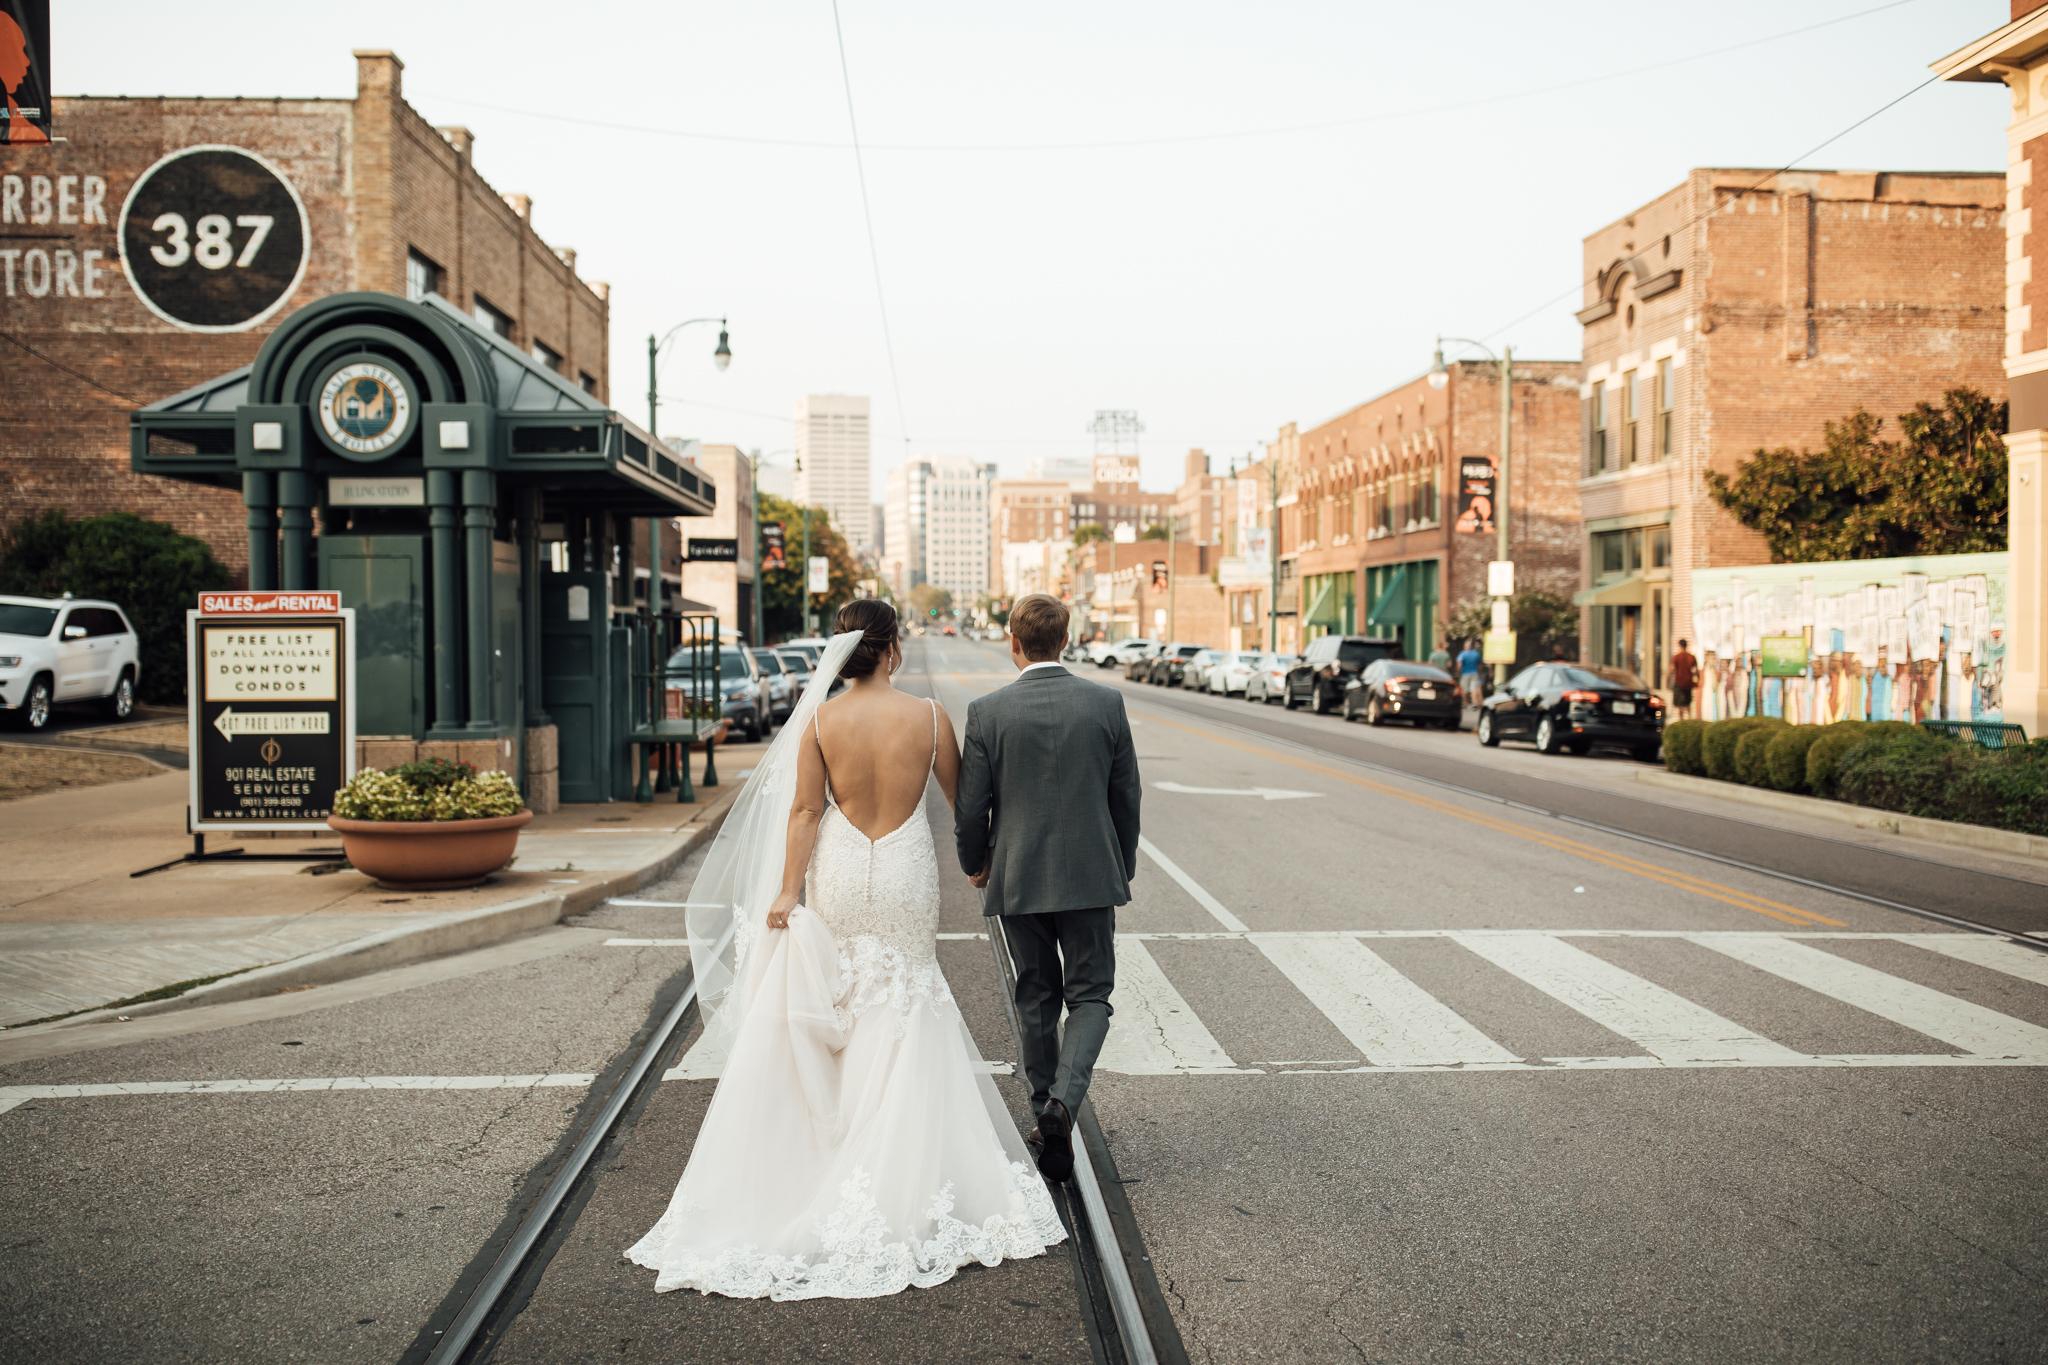 409smain-downtown-memphis-wedding-venue-thewarmtharoundyou (111 of 243).jpg